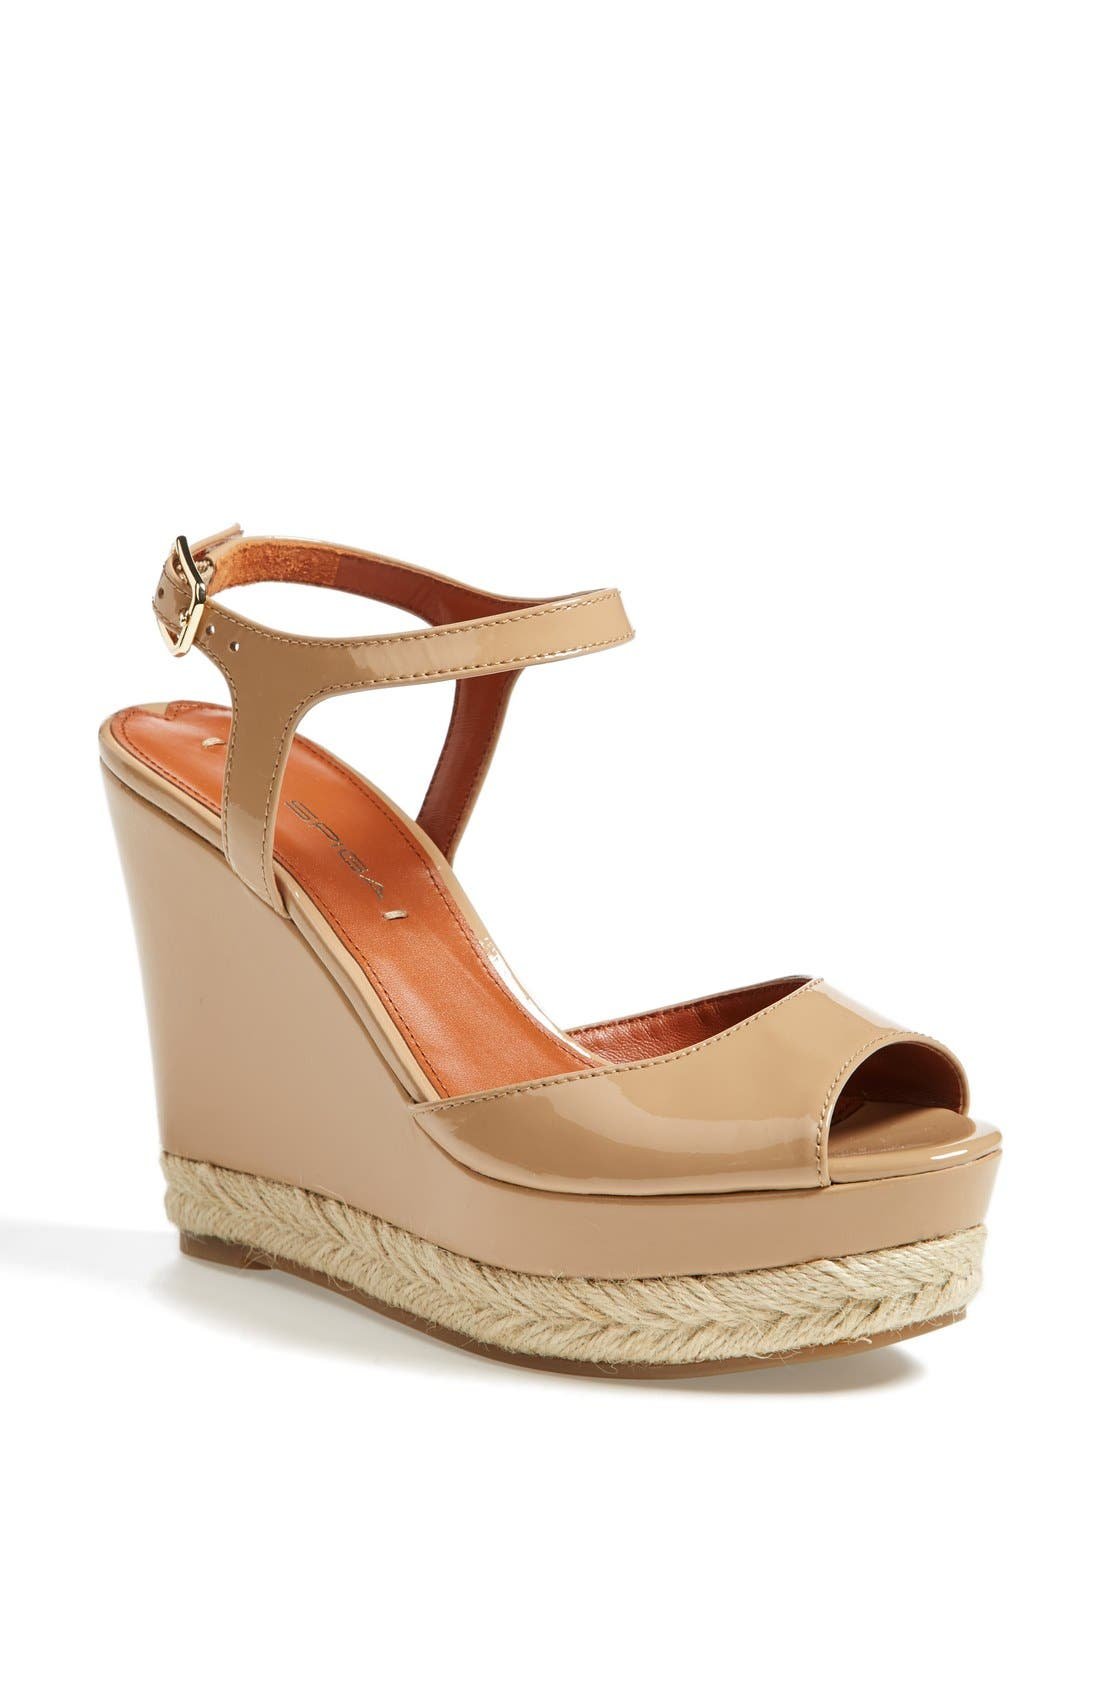 Alternate Image 1 Selected - Via Spiga 'Melia' Wedge Sandal